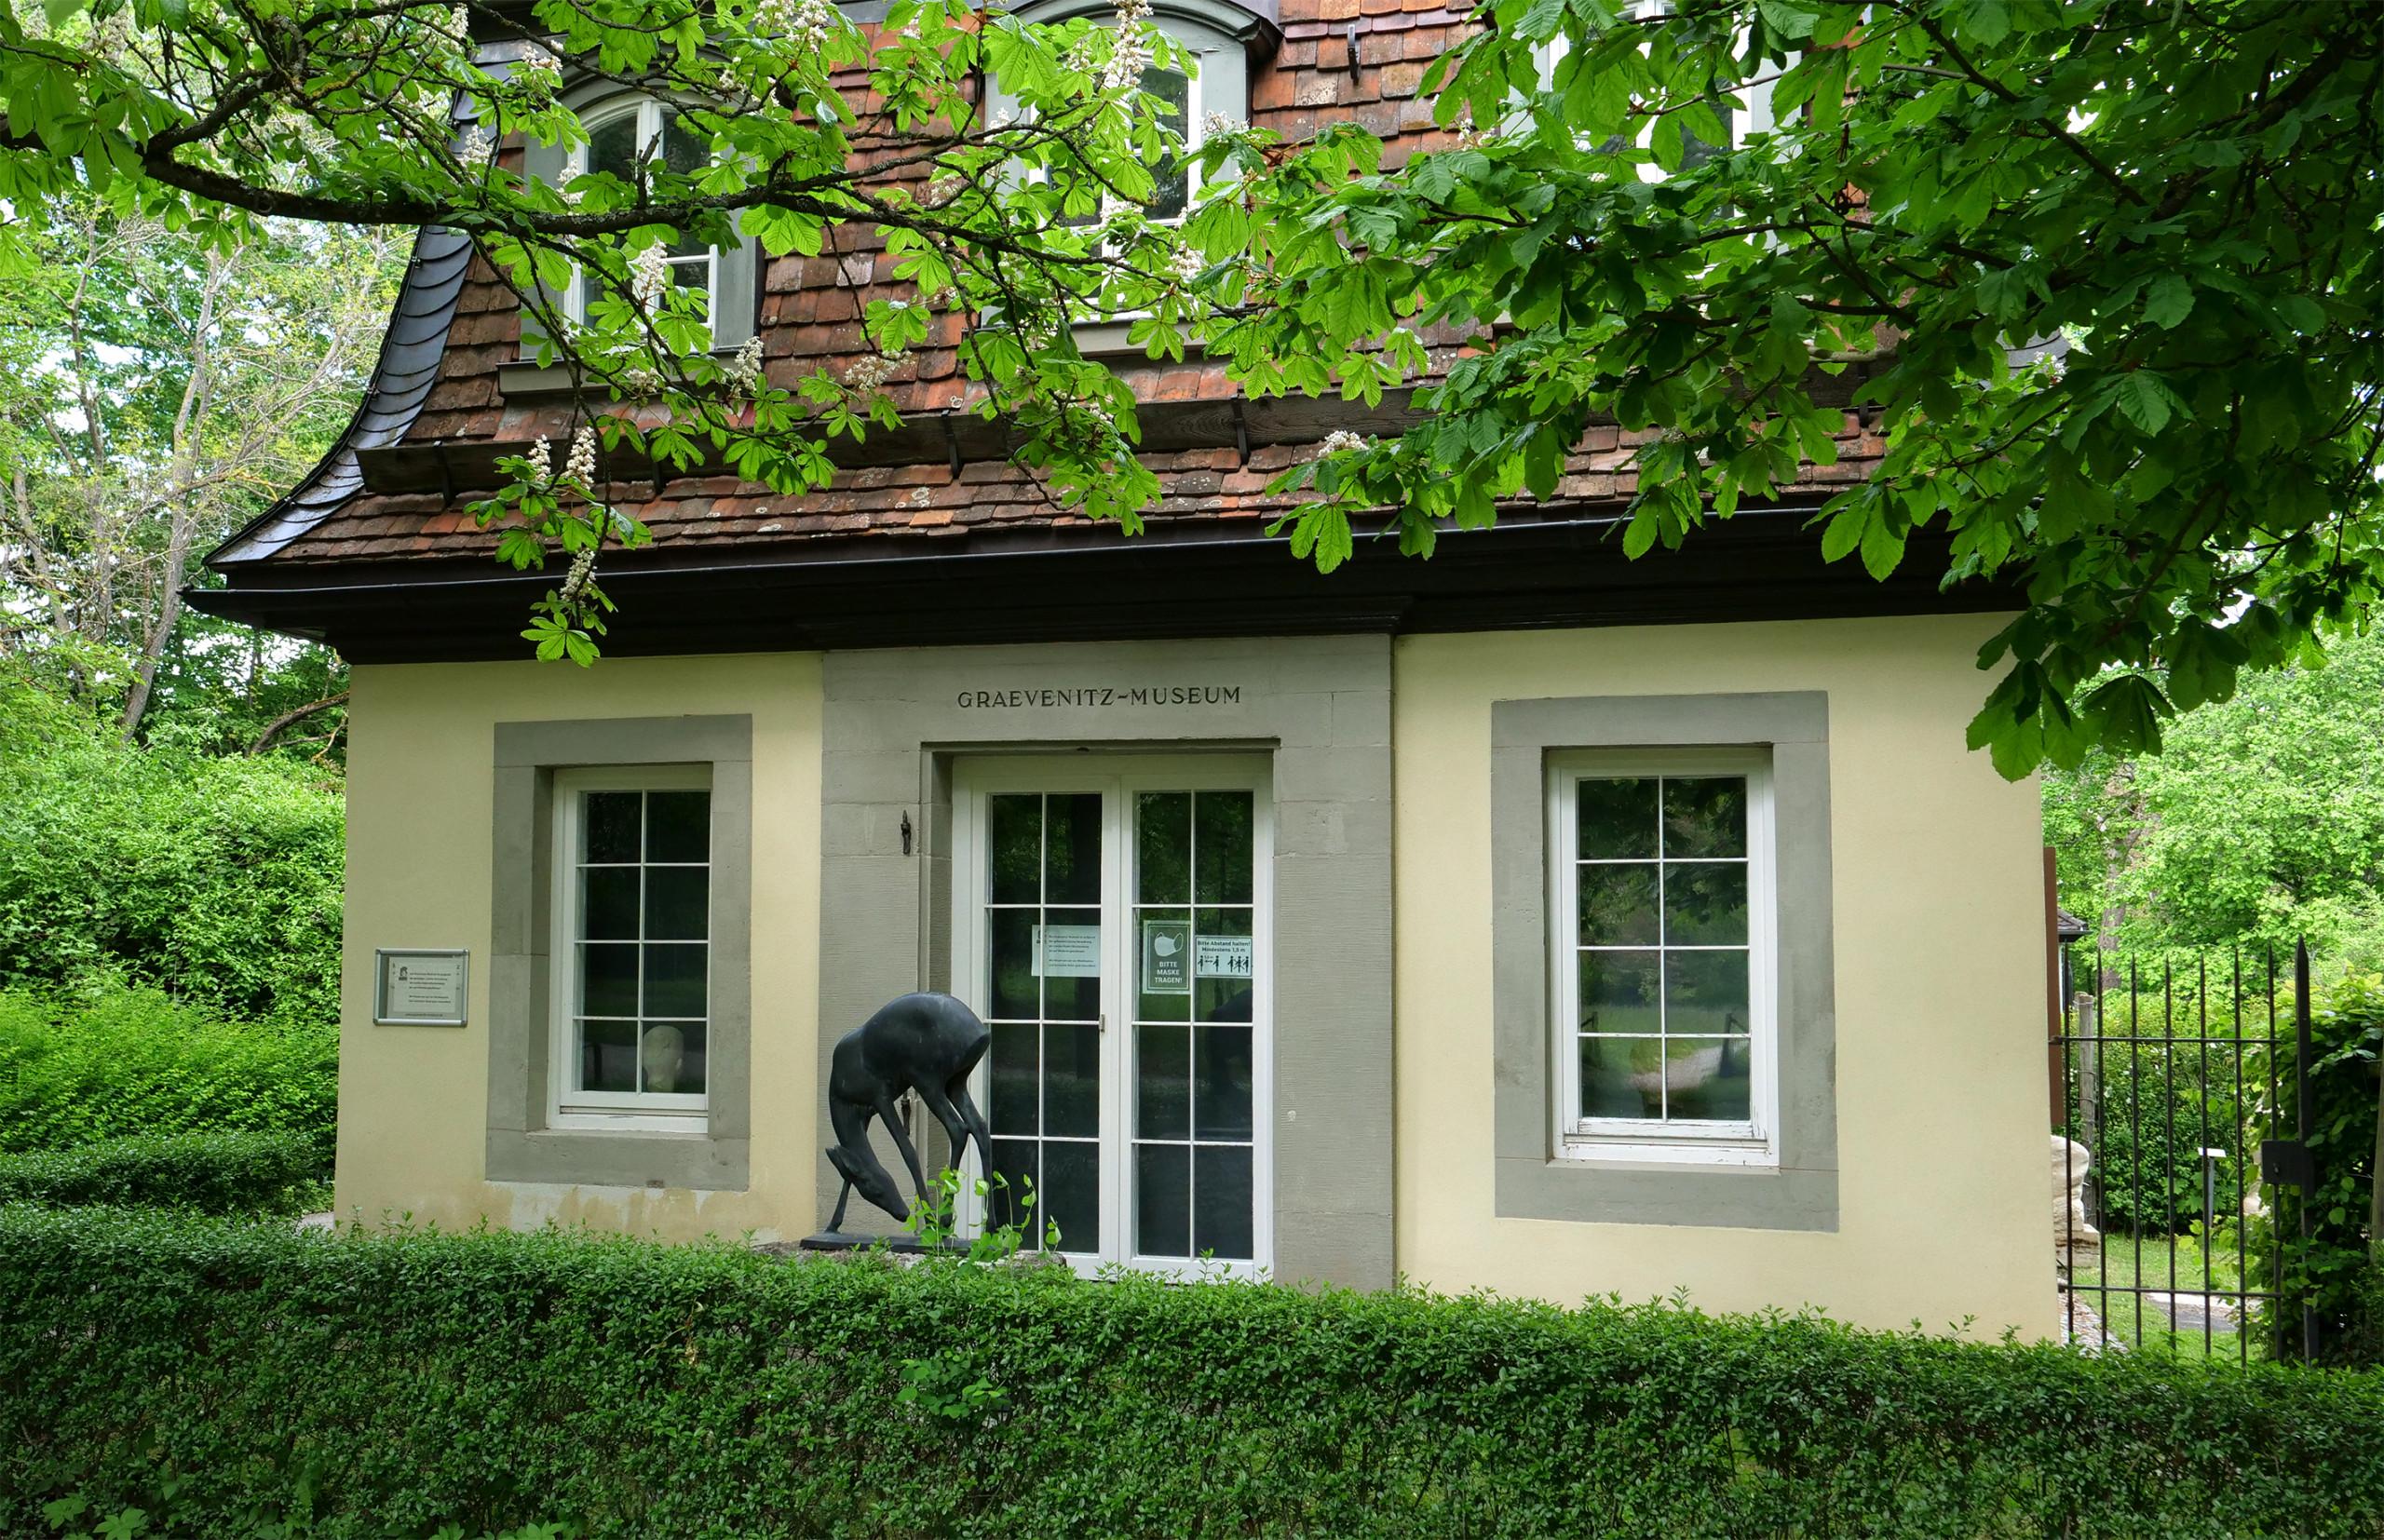 Graevenitz Museum, Schloss Solitude, Stuttgart. Photo: Angela Anderson (2021)